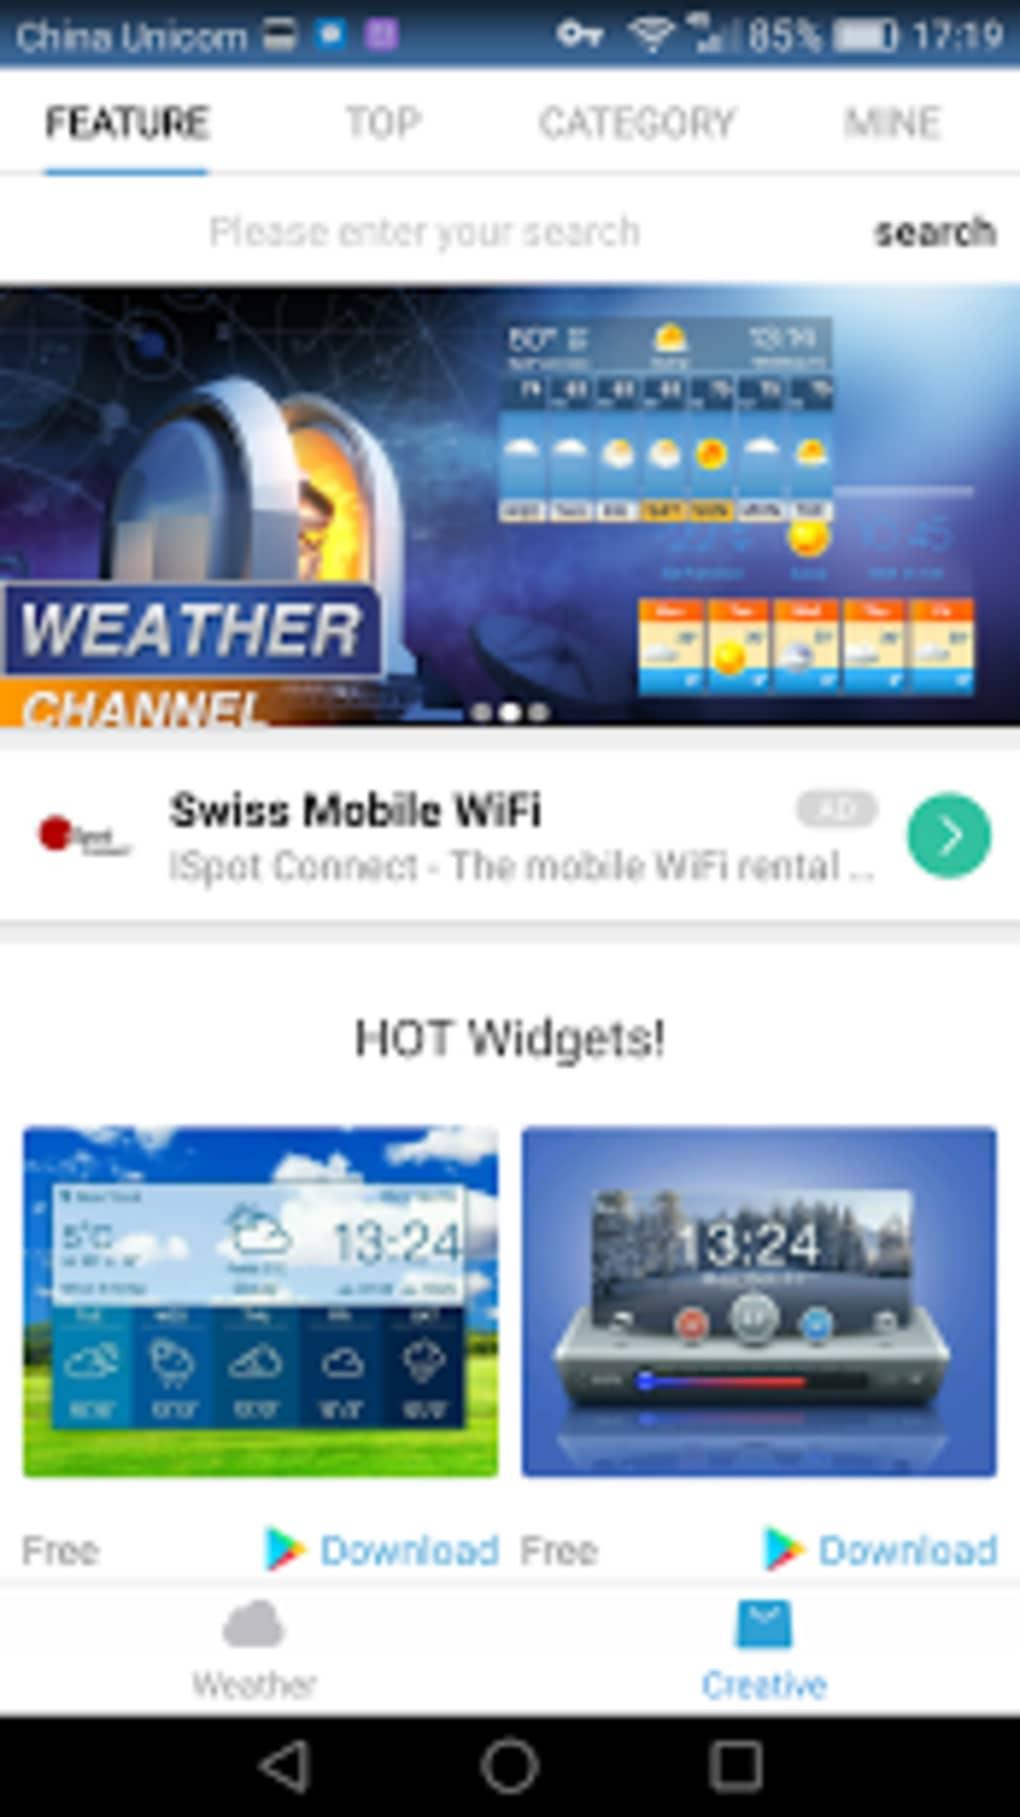 Best Clock & Weather Widget for Android - Download